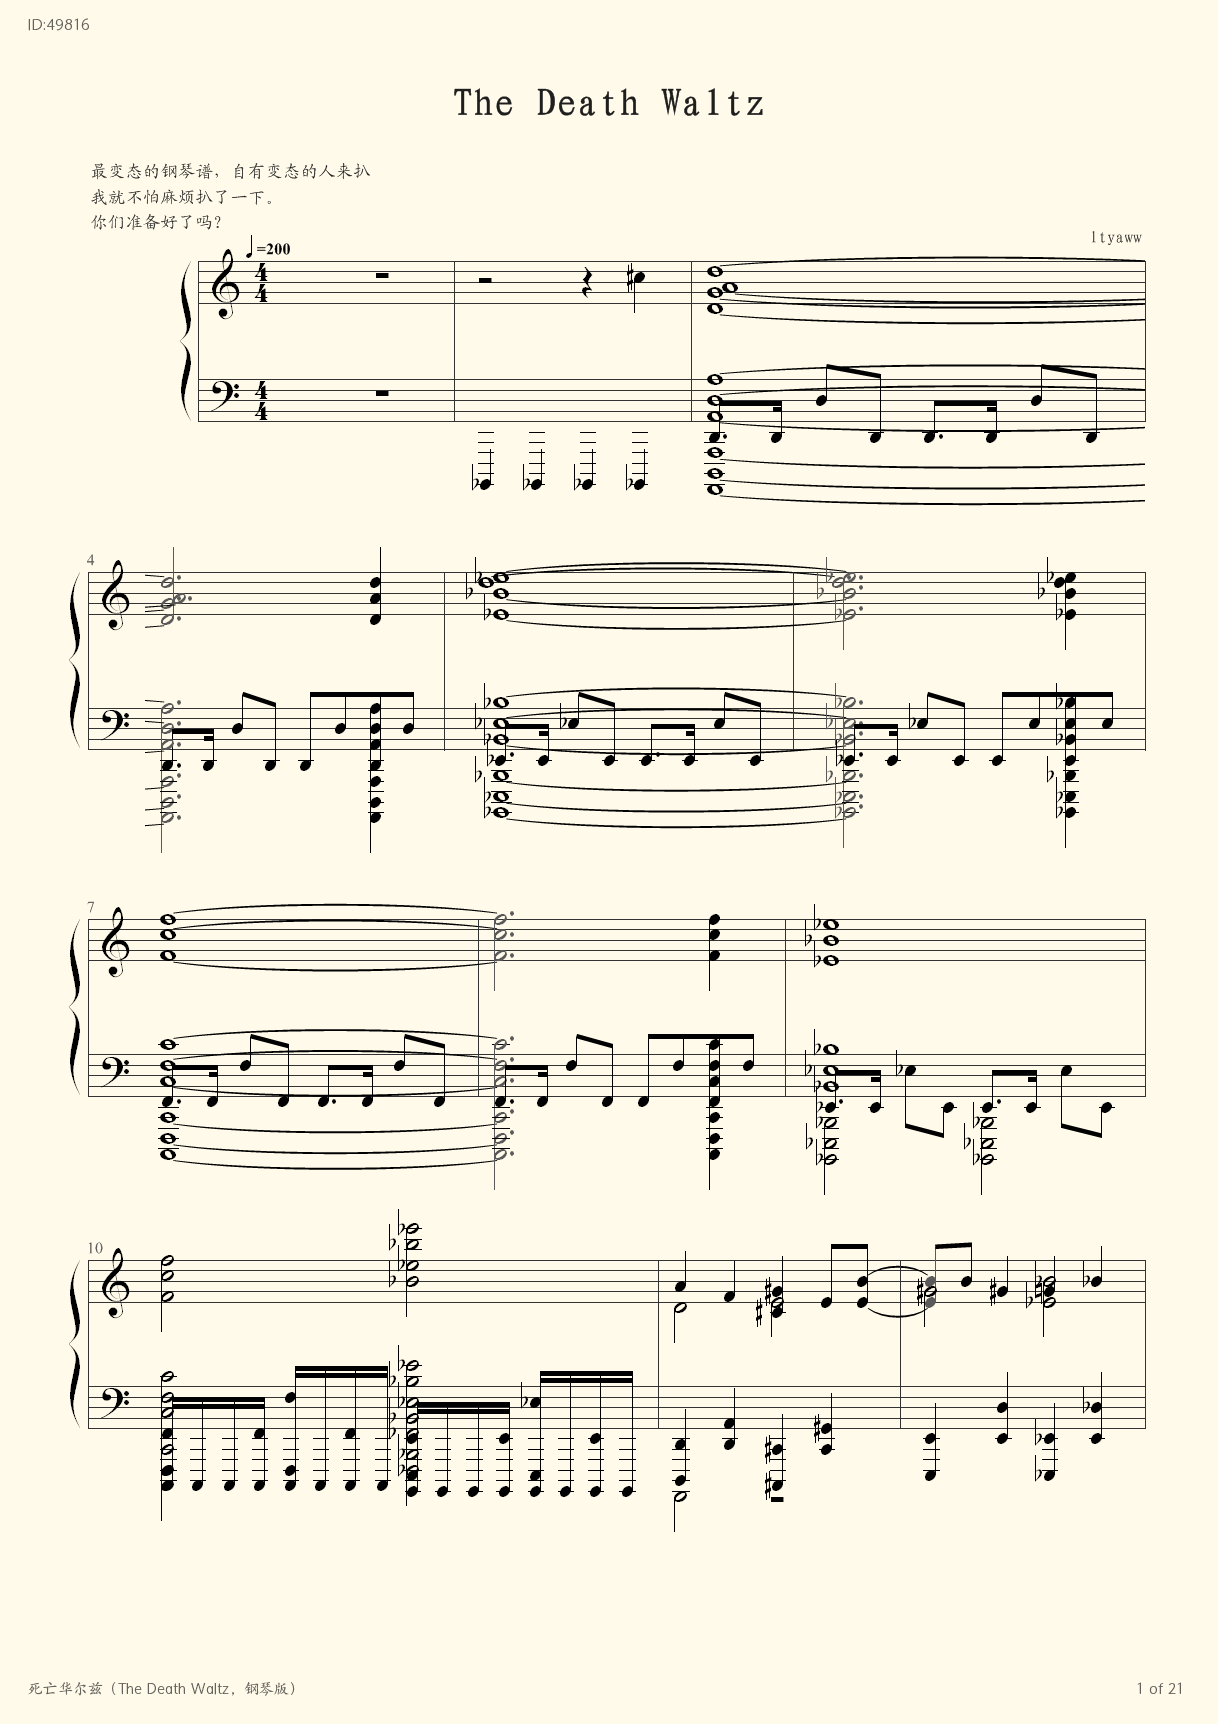 The Death Waltz  - Unknown - first page